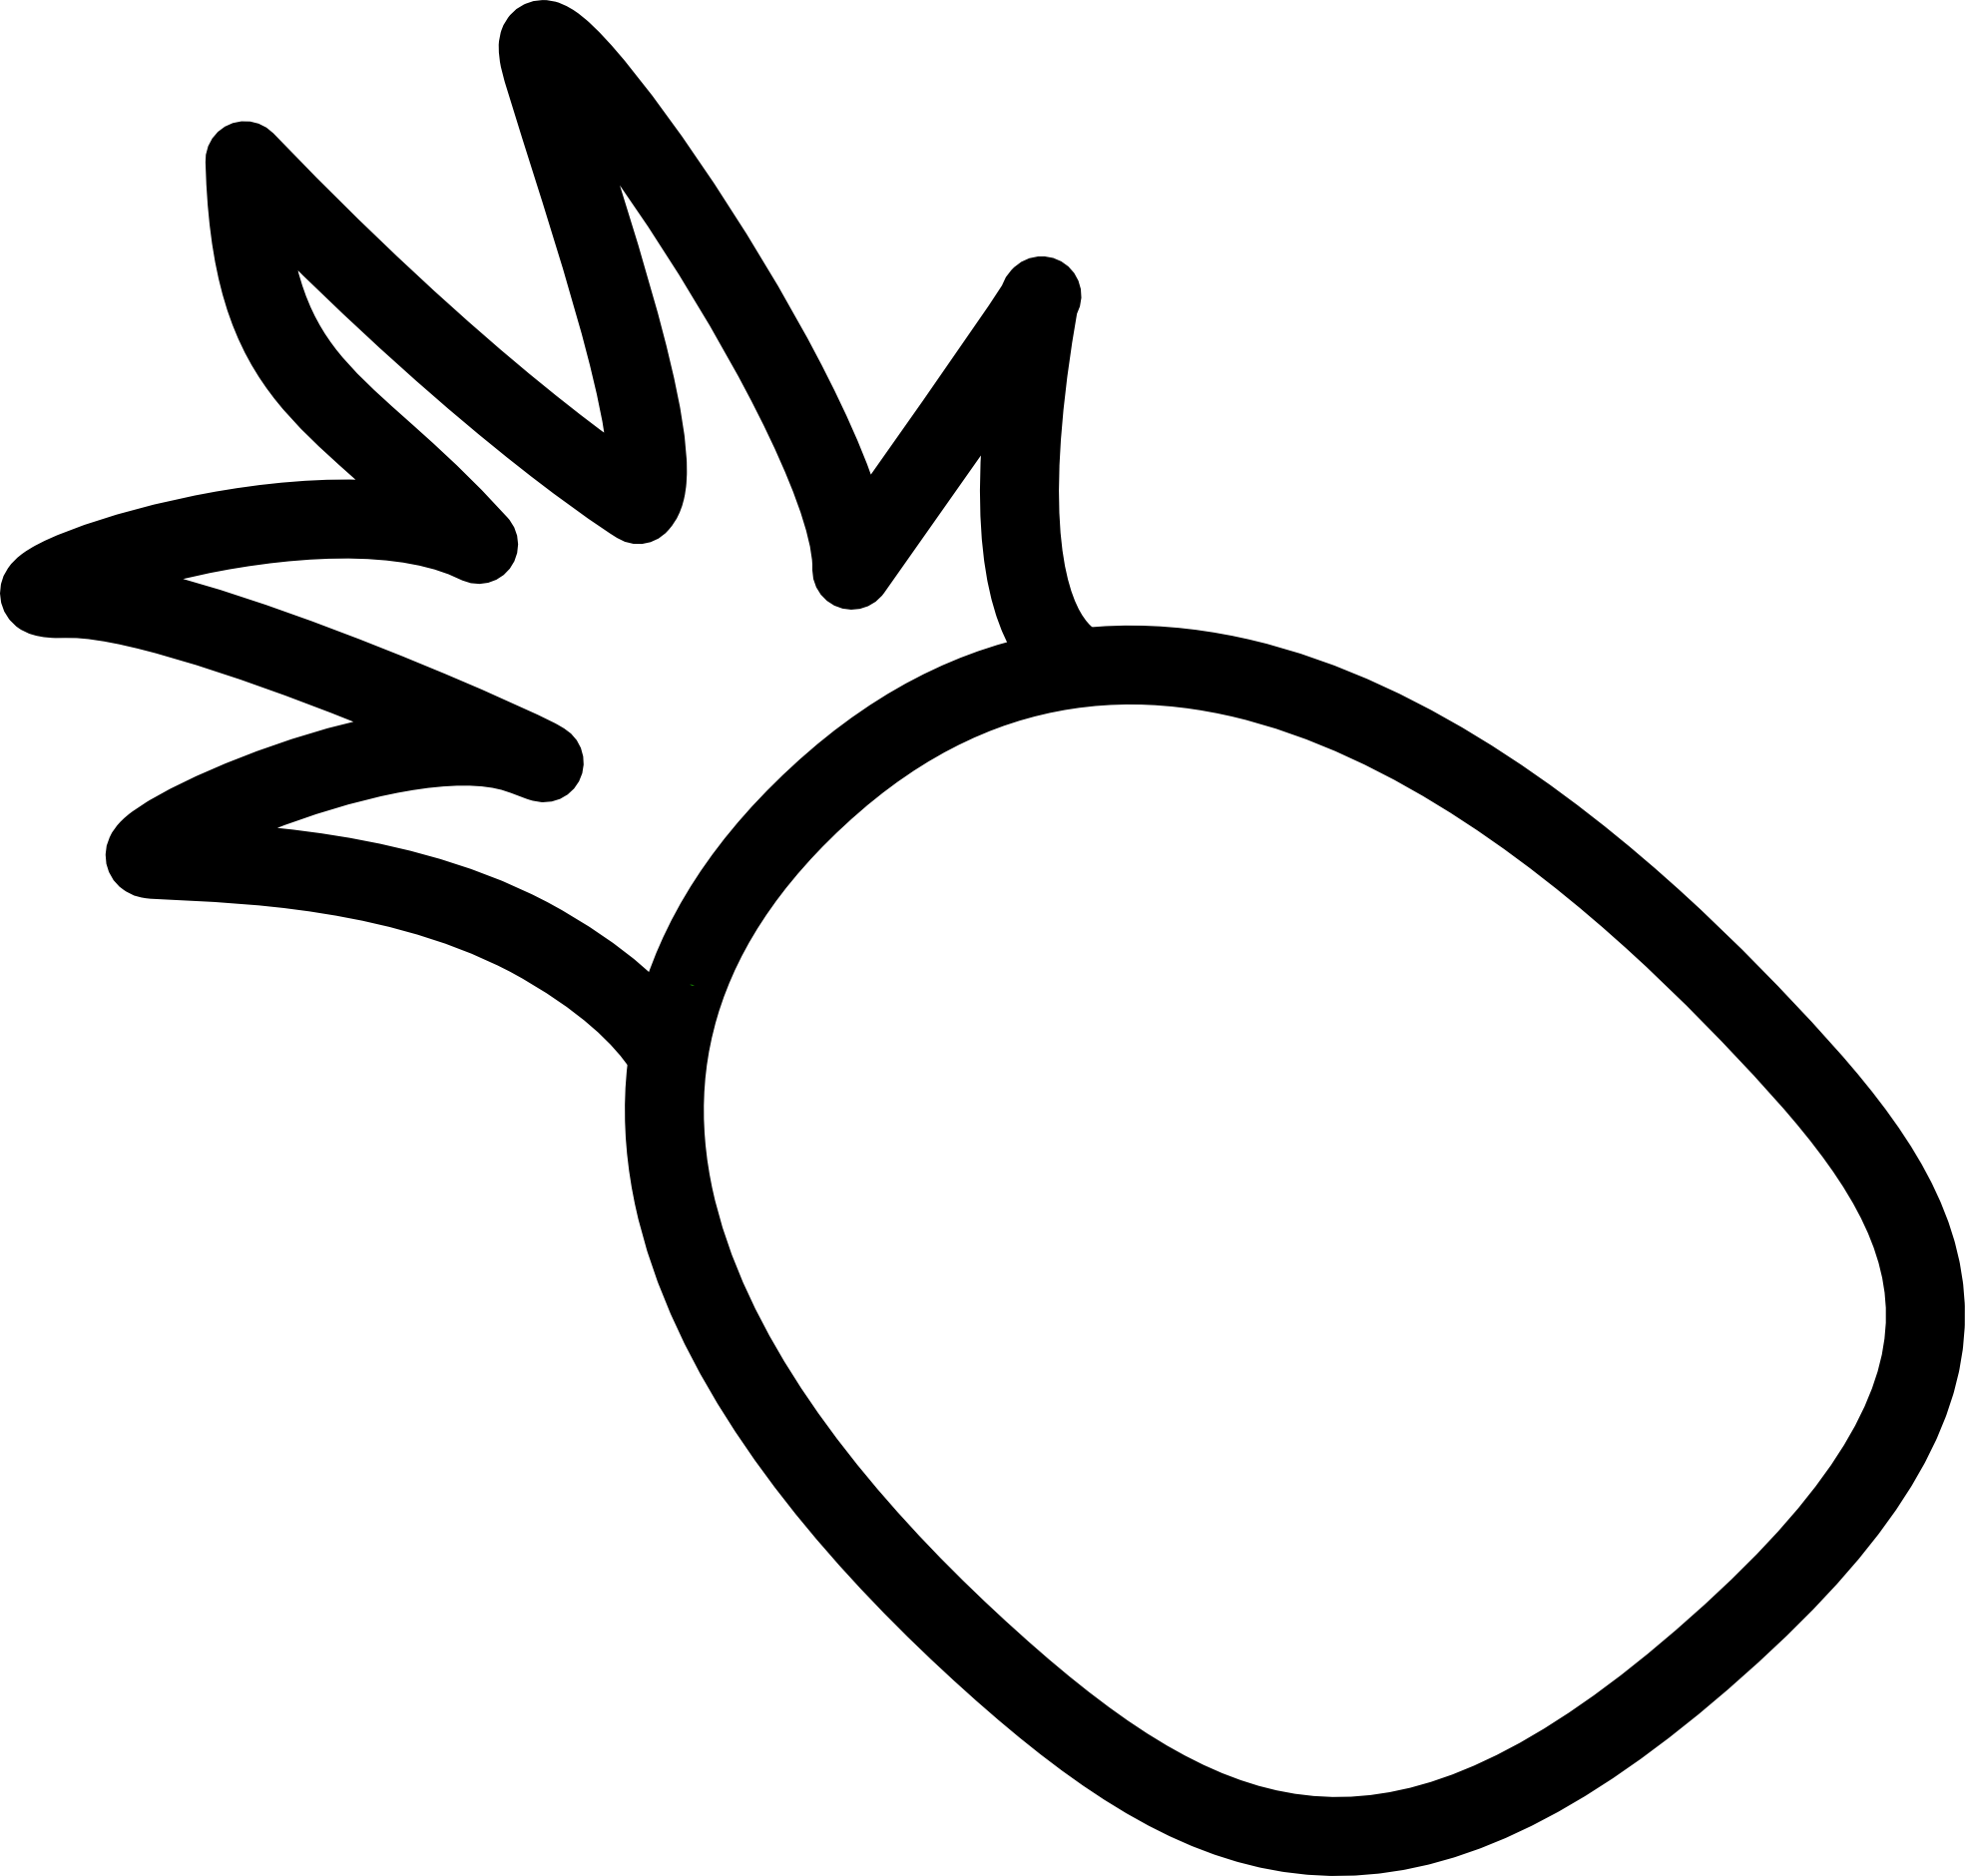 Adobe clipart gallery svg royalty free Adobe Illustrator Clip Art | Tattoo | Pineapple tattoo, Pineapple ... svg royalty free